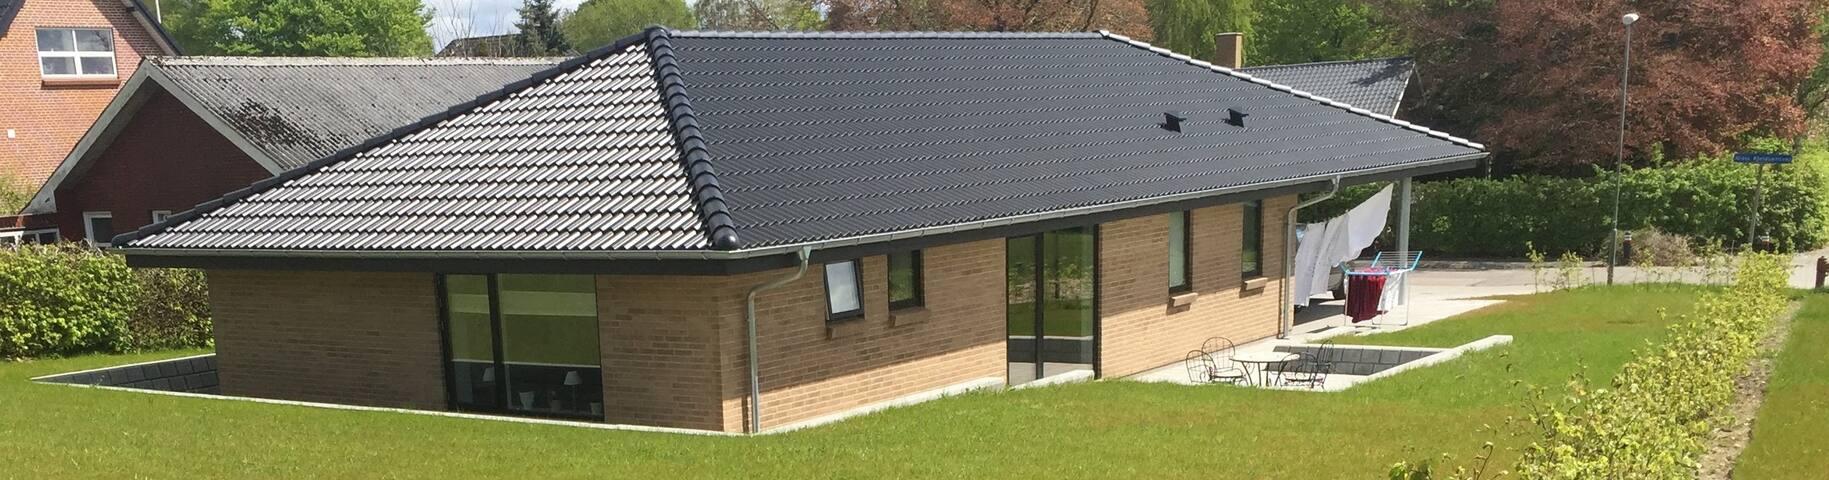 House near Legoland and Billund Airport